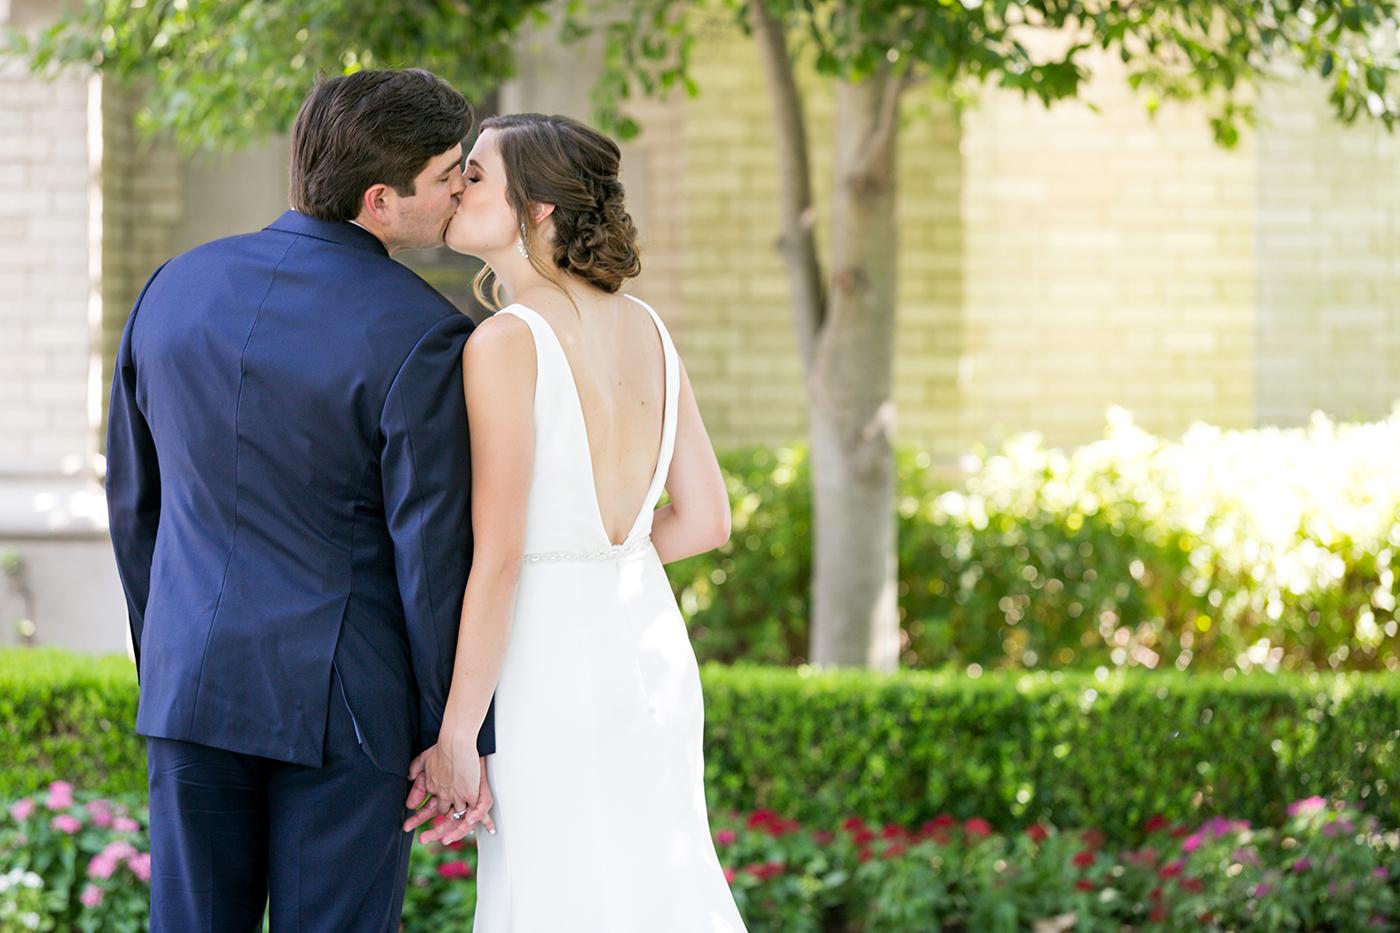 Wedding Planner Dallas TX - Allday Events - Highland Park - Marie Gabrielle Wedding - 185.jpg